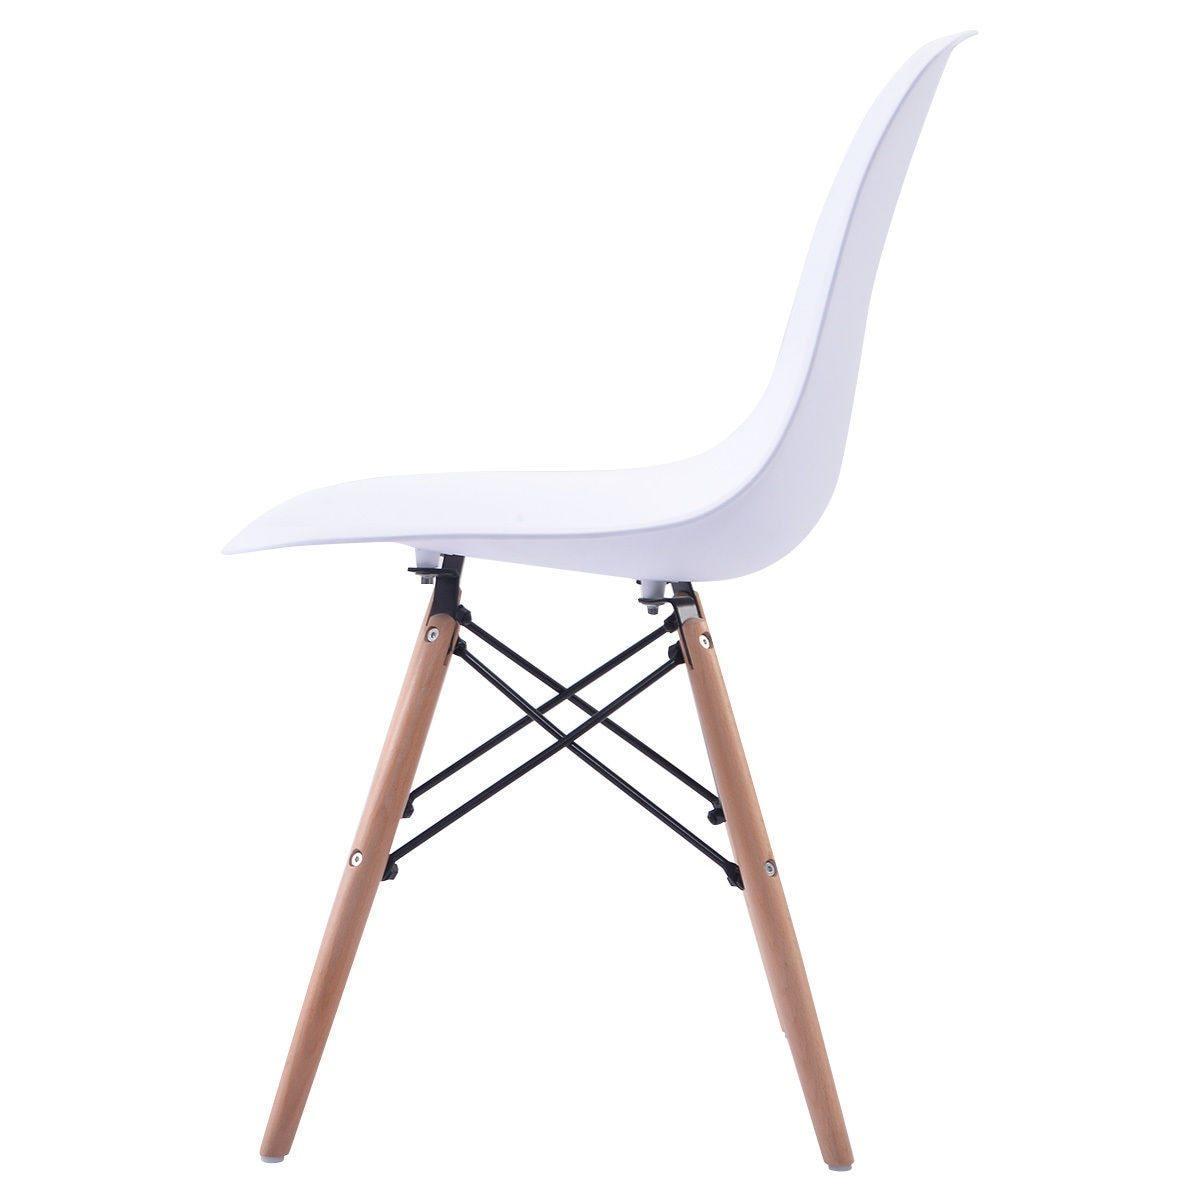 2 Piece White Modern Minimalist Dining Chairs